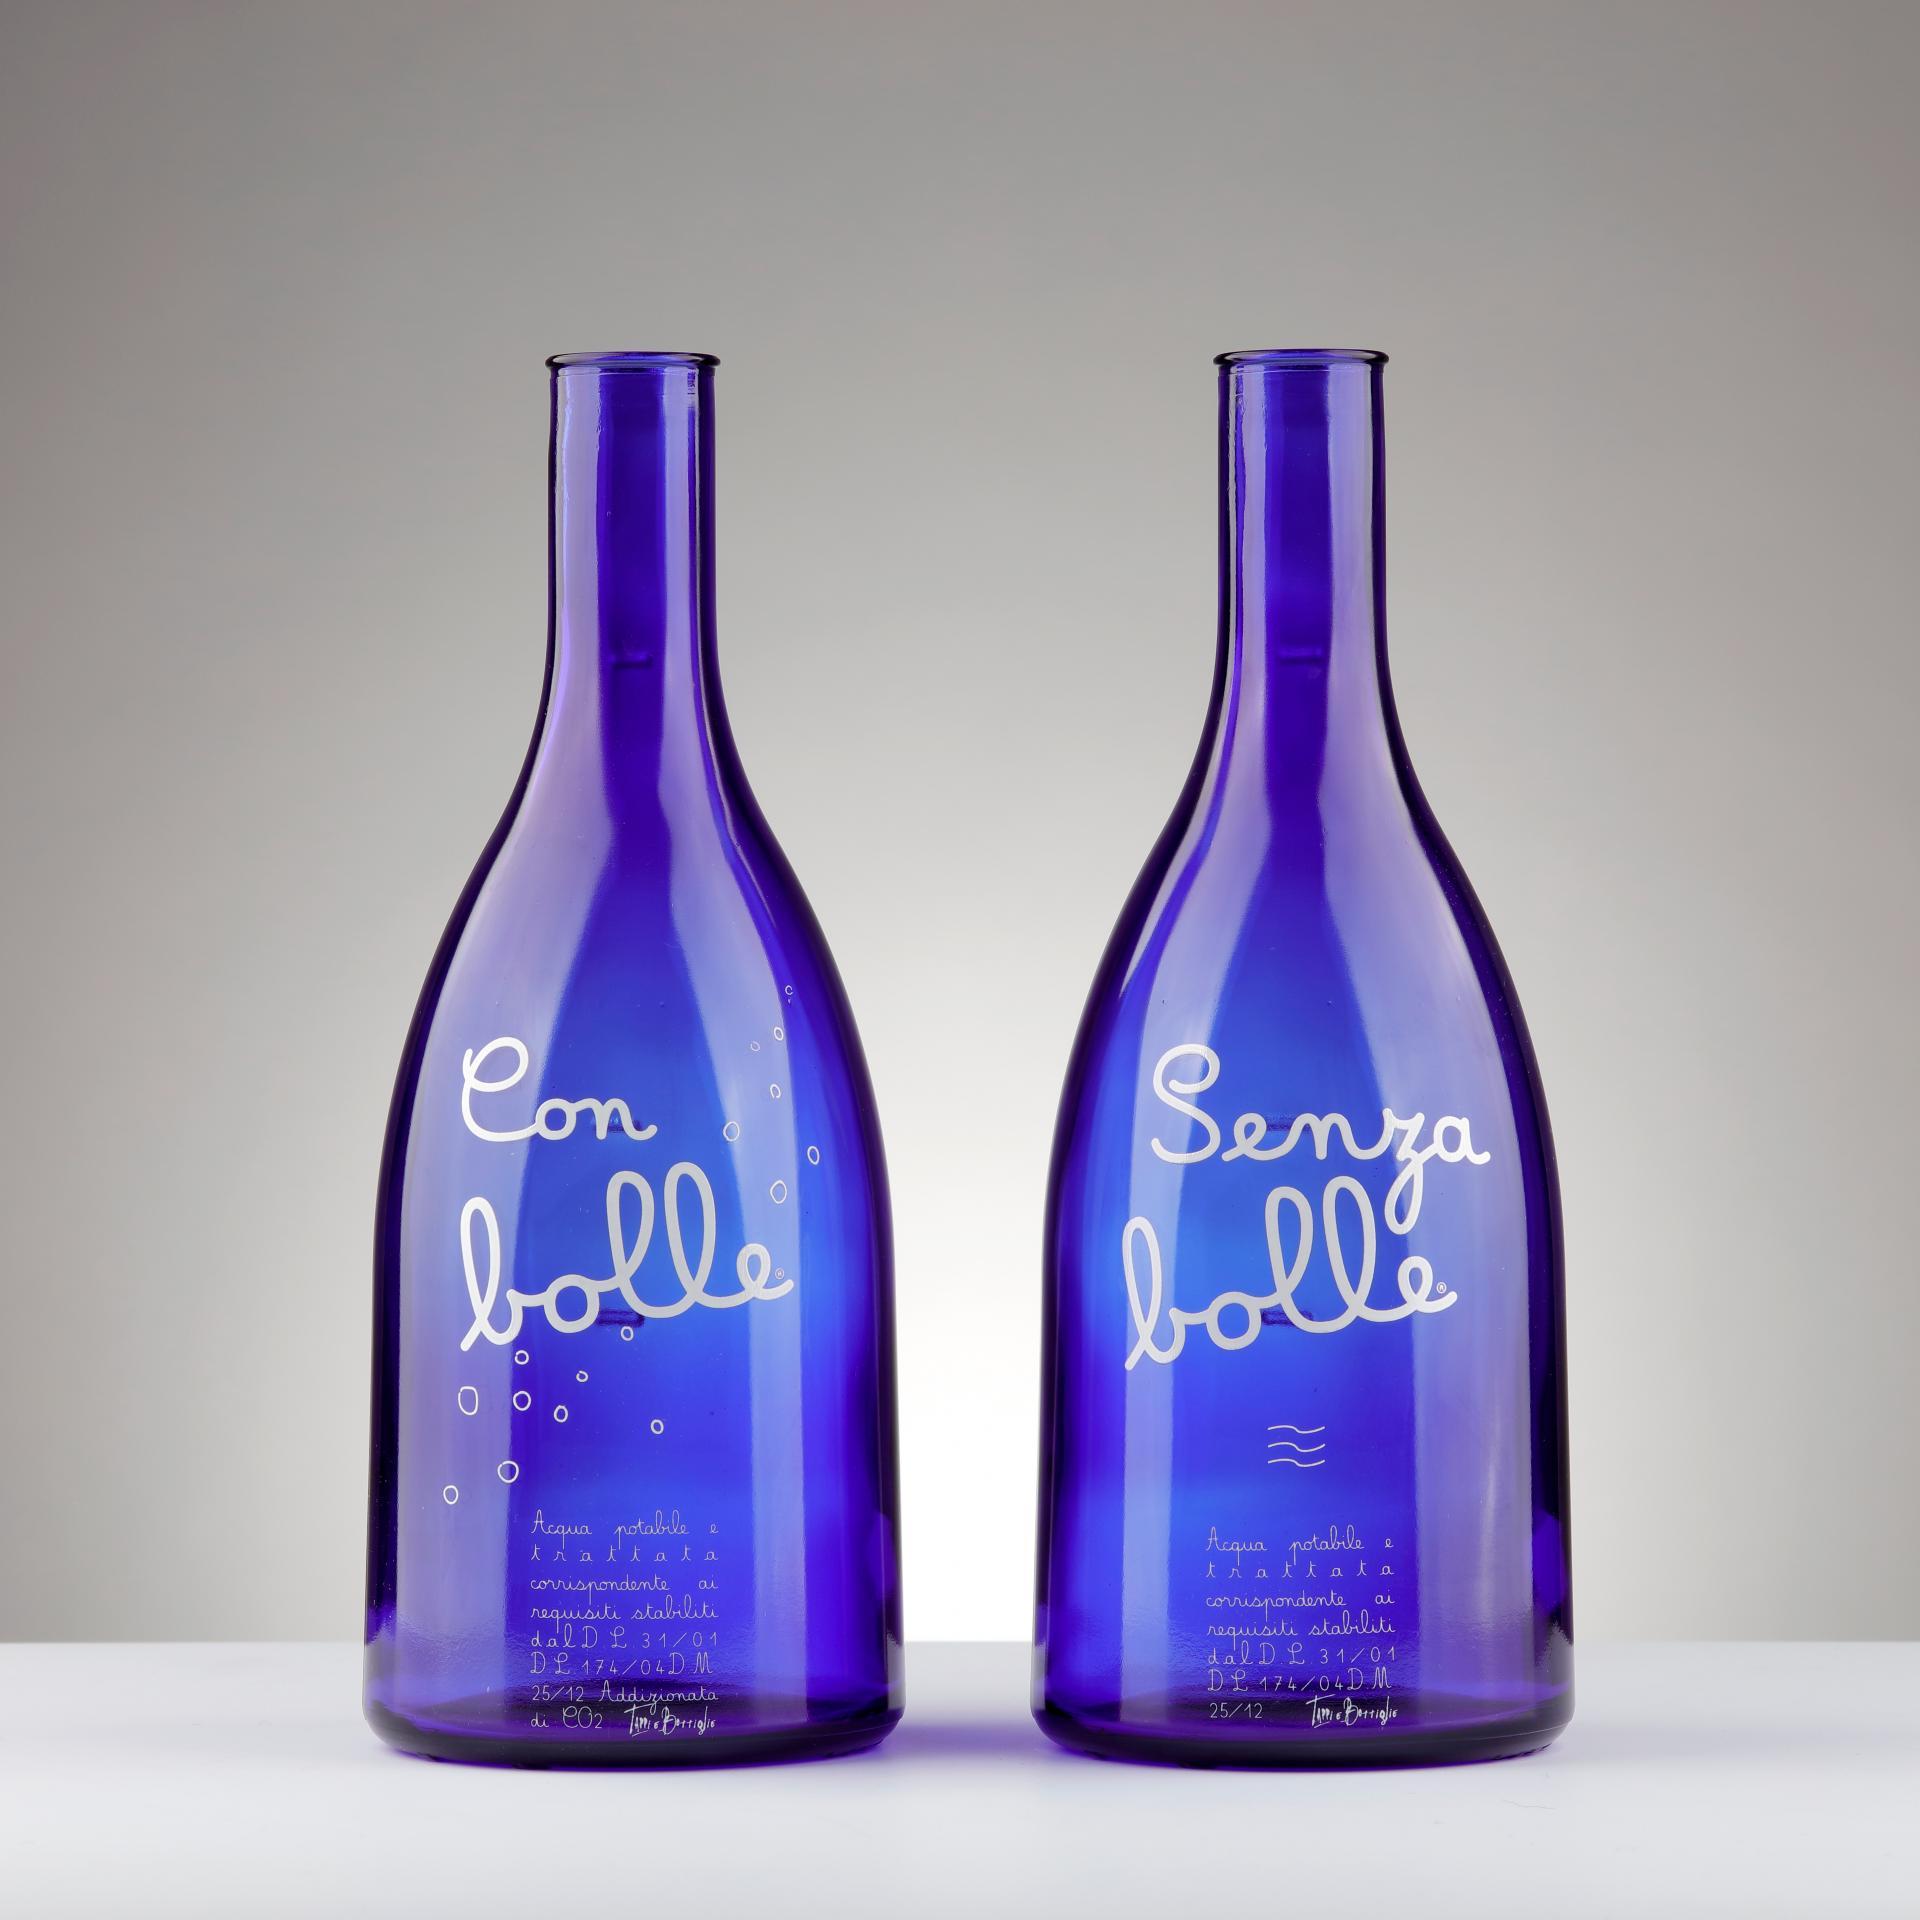 ortensia-blu-bolle-b,4181?WebbinsCacheCounter=1